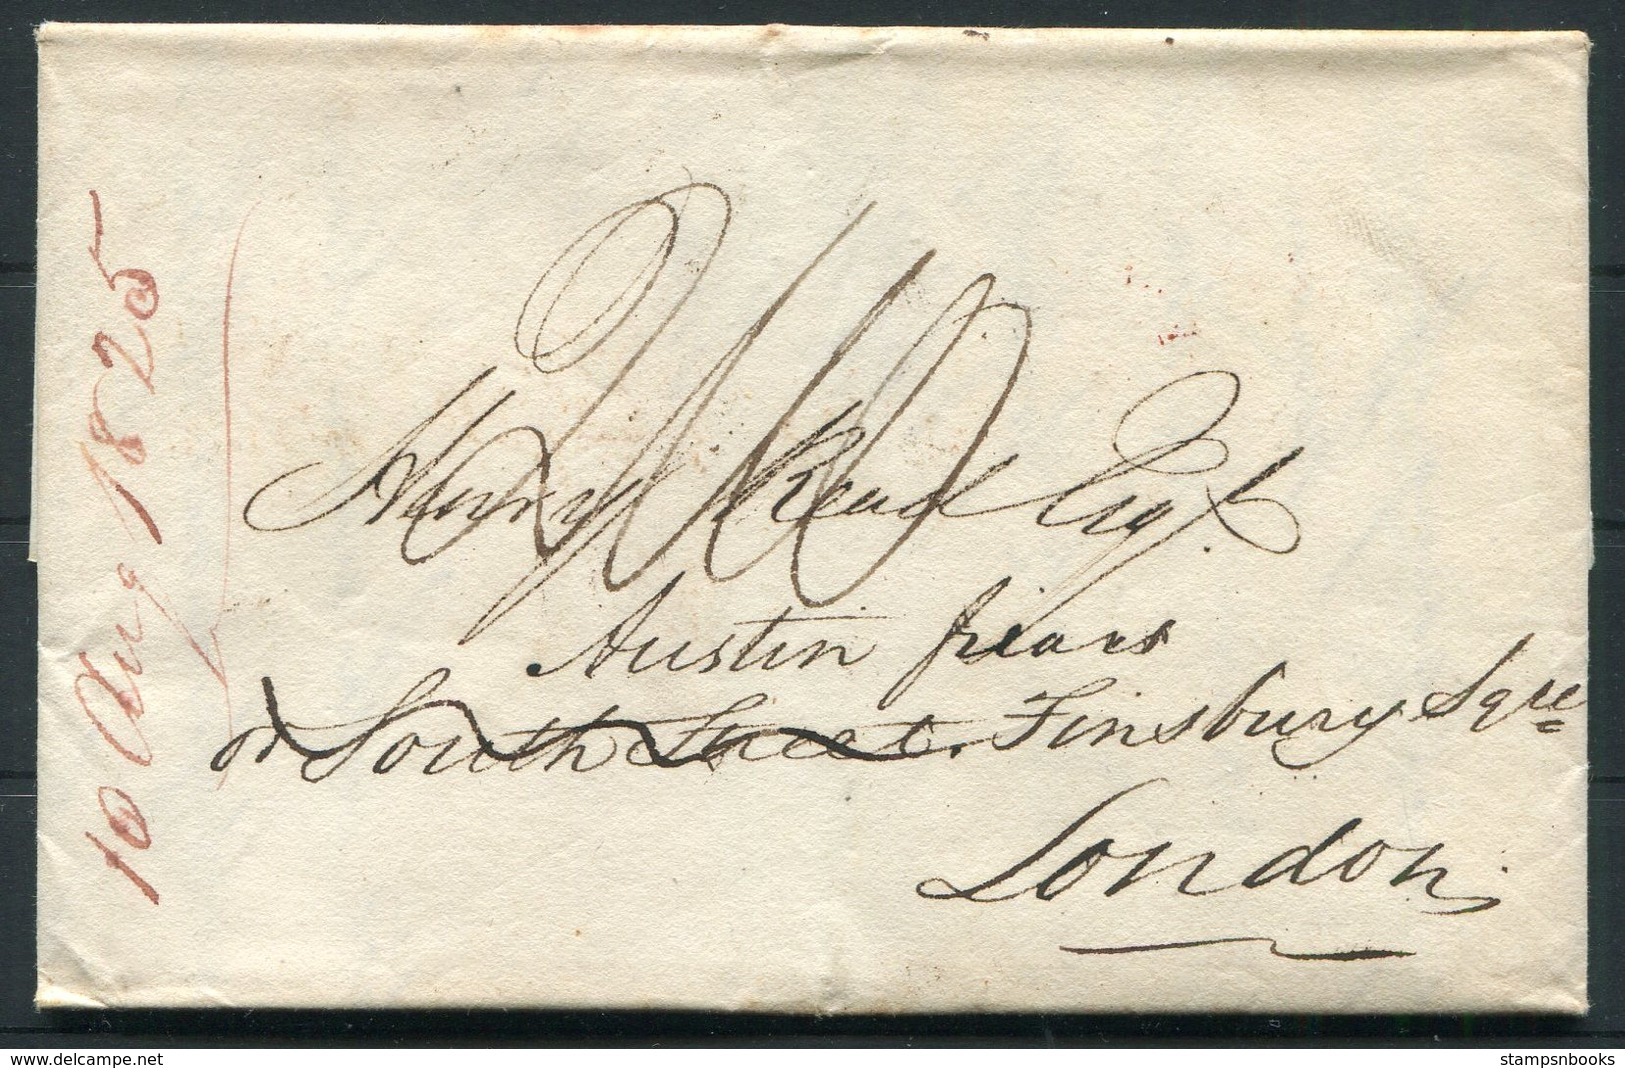 1825 Canton China - London Entire + Letter. Lymington Ship Letter. - Great Britain